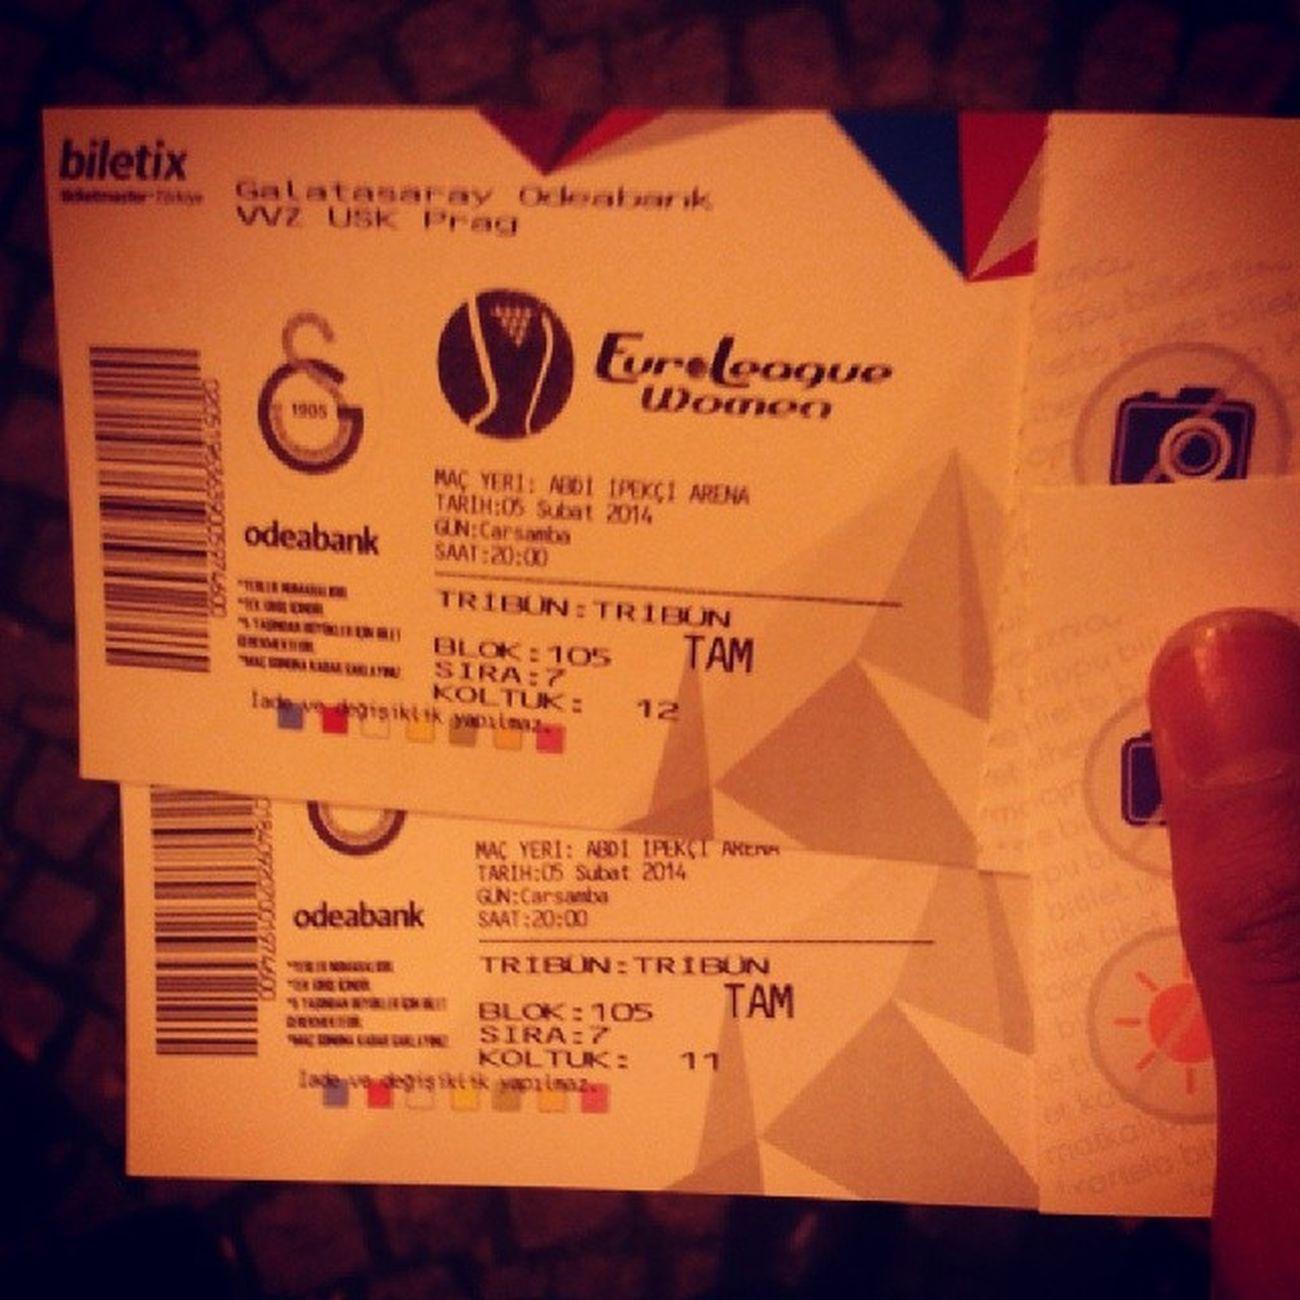 Sevda soguk dinlemez Ticket Women Basketboll 1tl funny happy euroleague women galatasaray uA